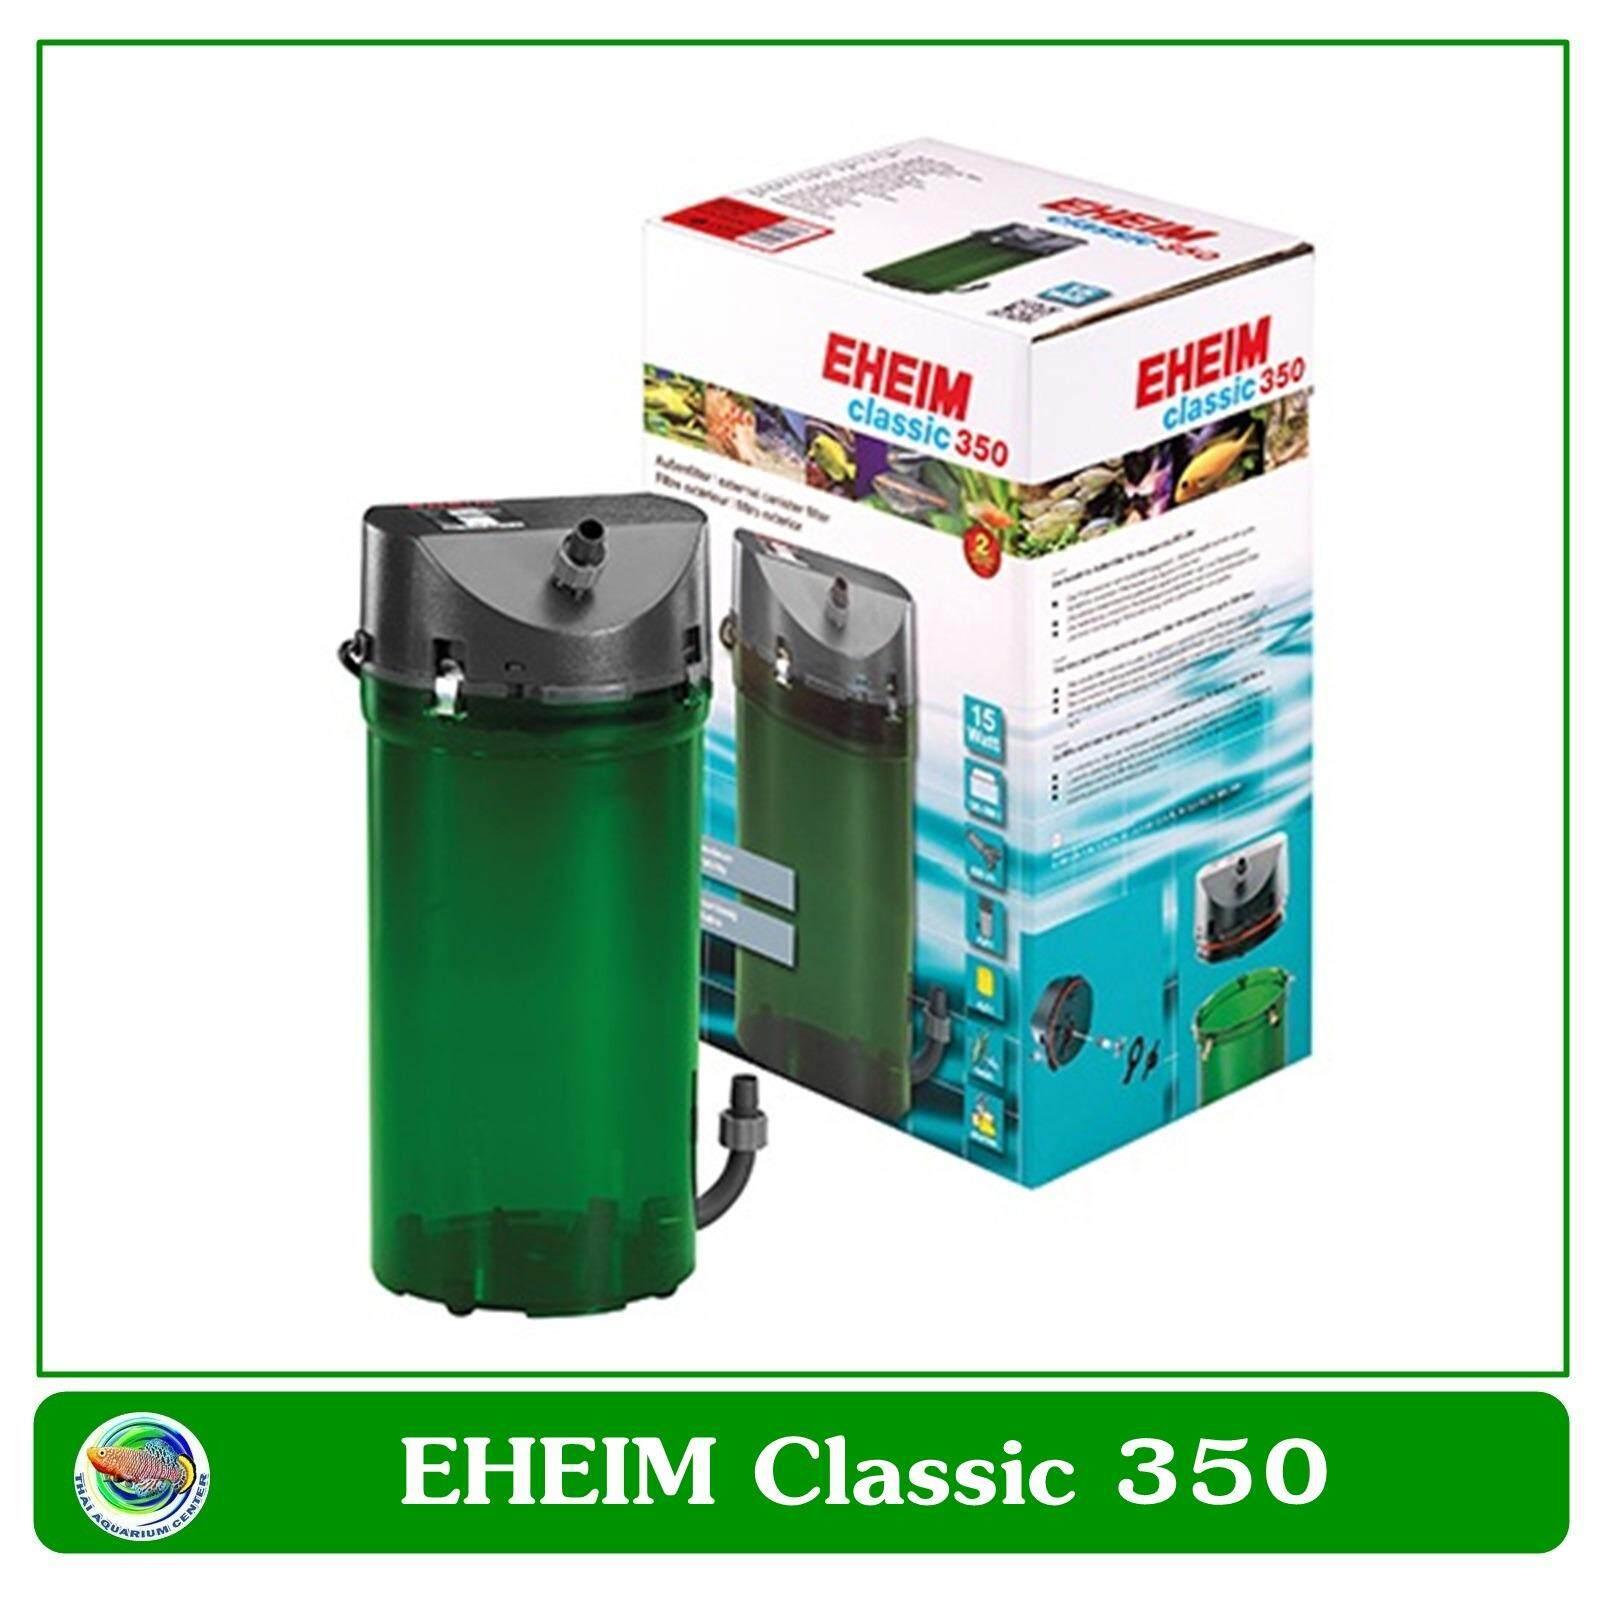 Eheim External Filter Classic 350 กรองนอกตู้ สำหรับตู้ปลาขนาด 30-36 นิ้ว.